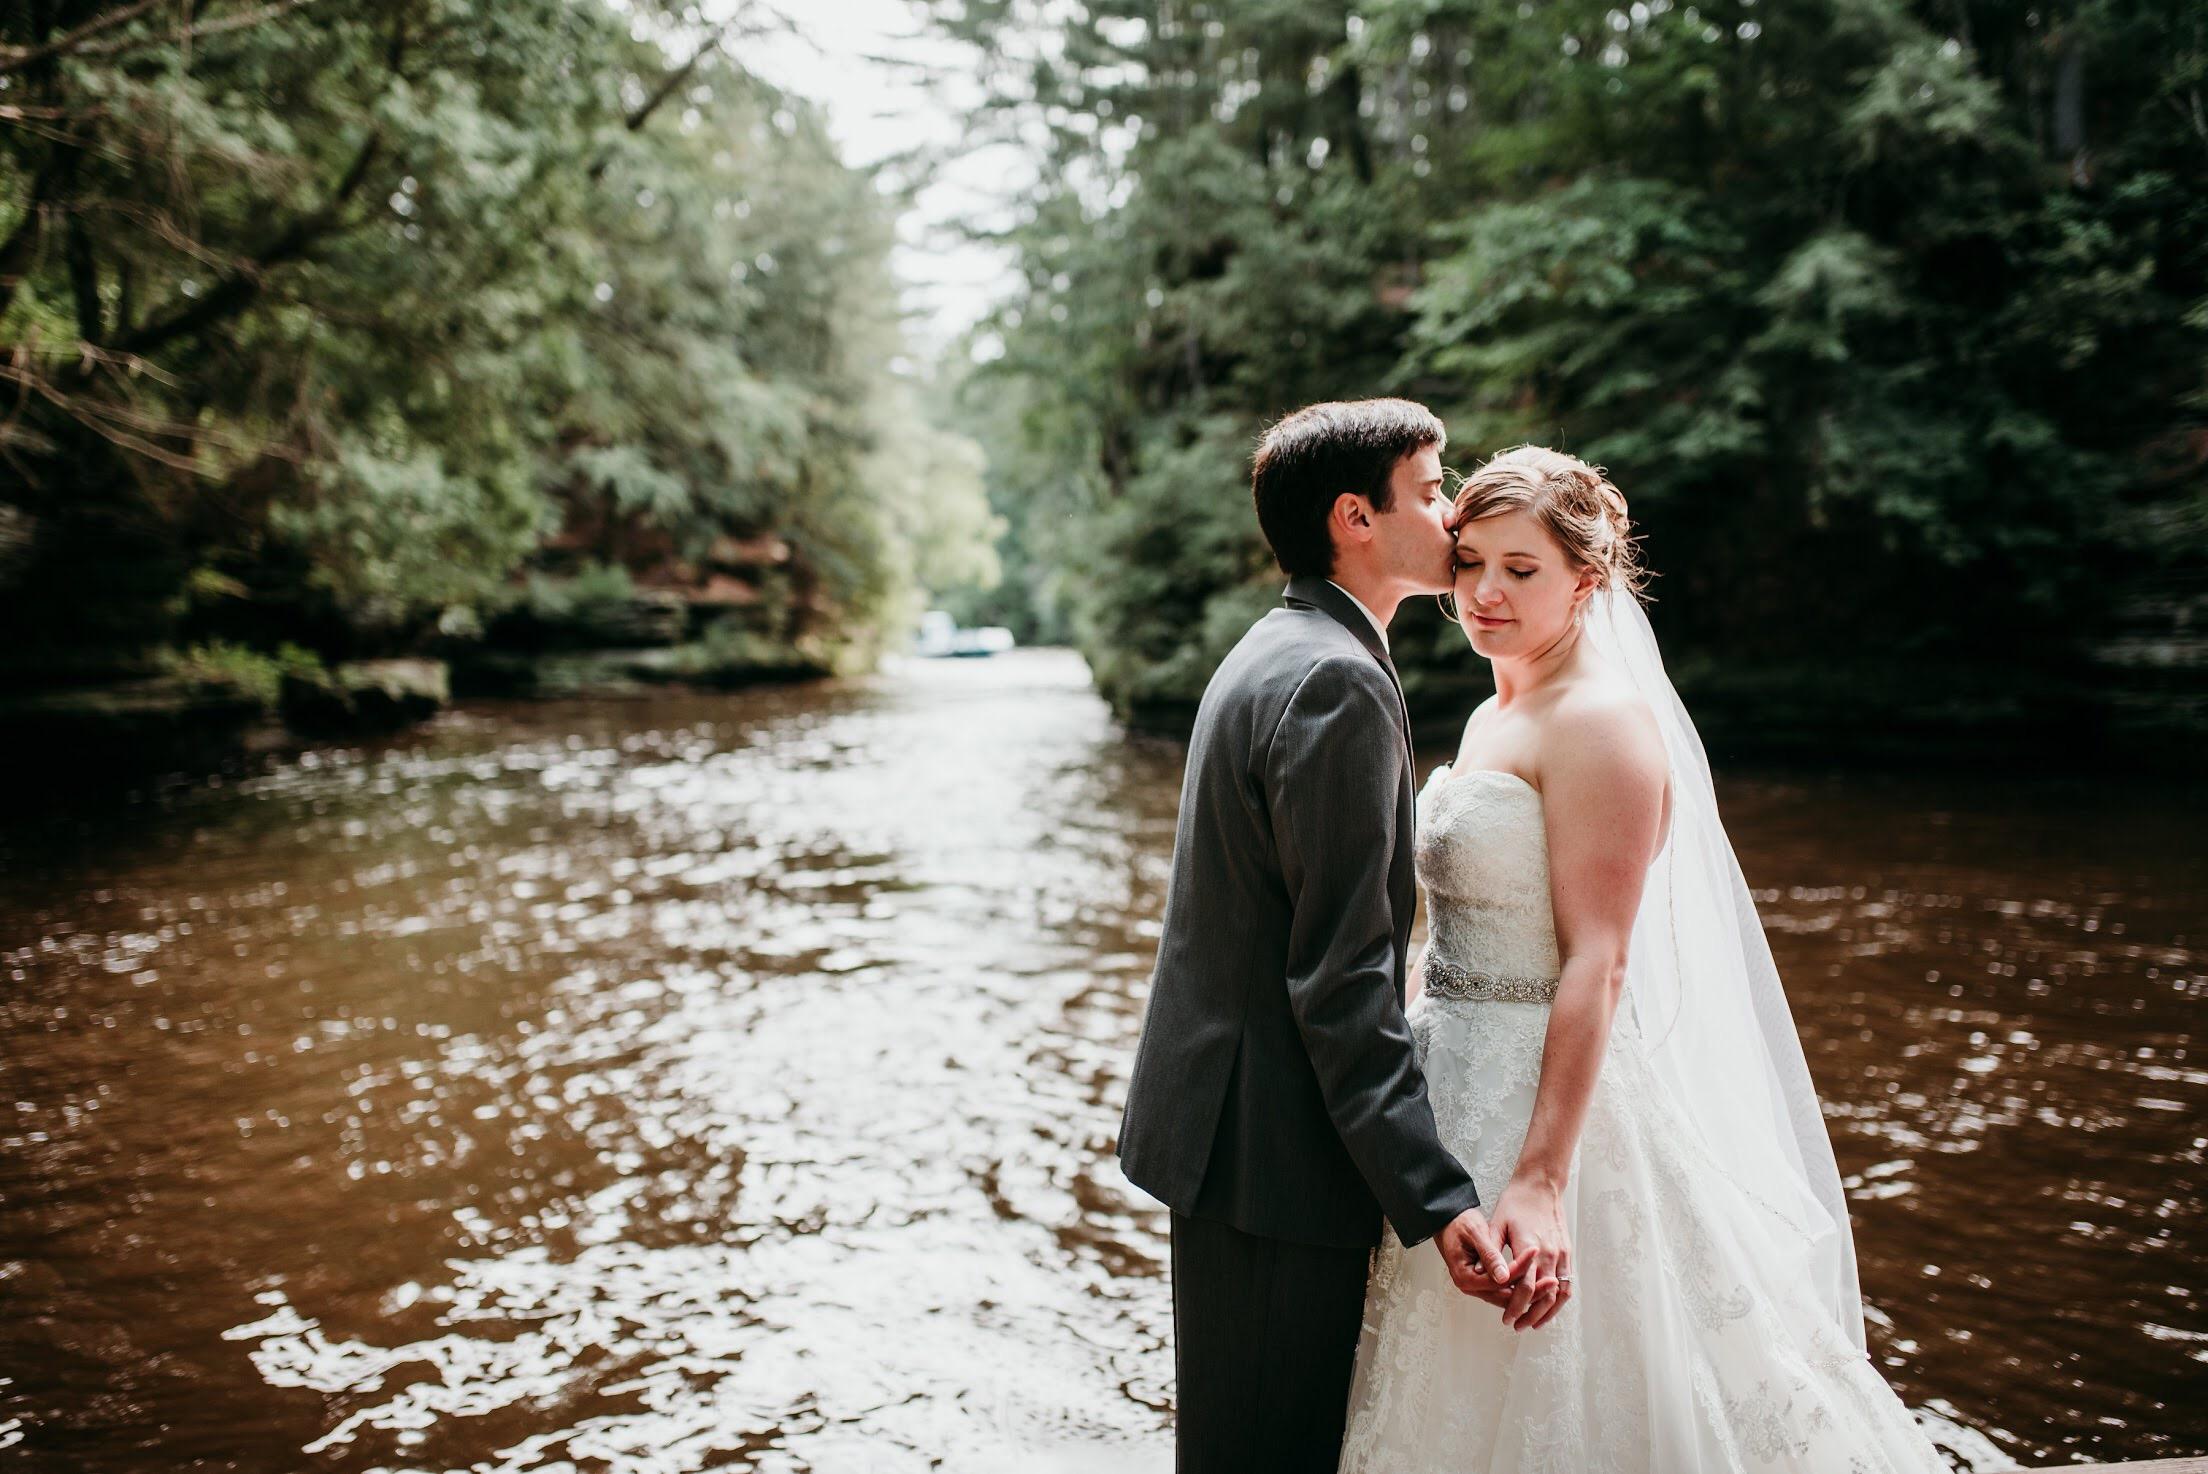 tara draper wisconsin dells - Madison wedding planner